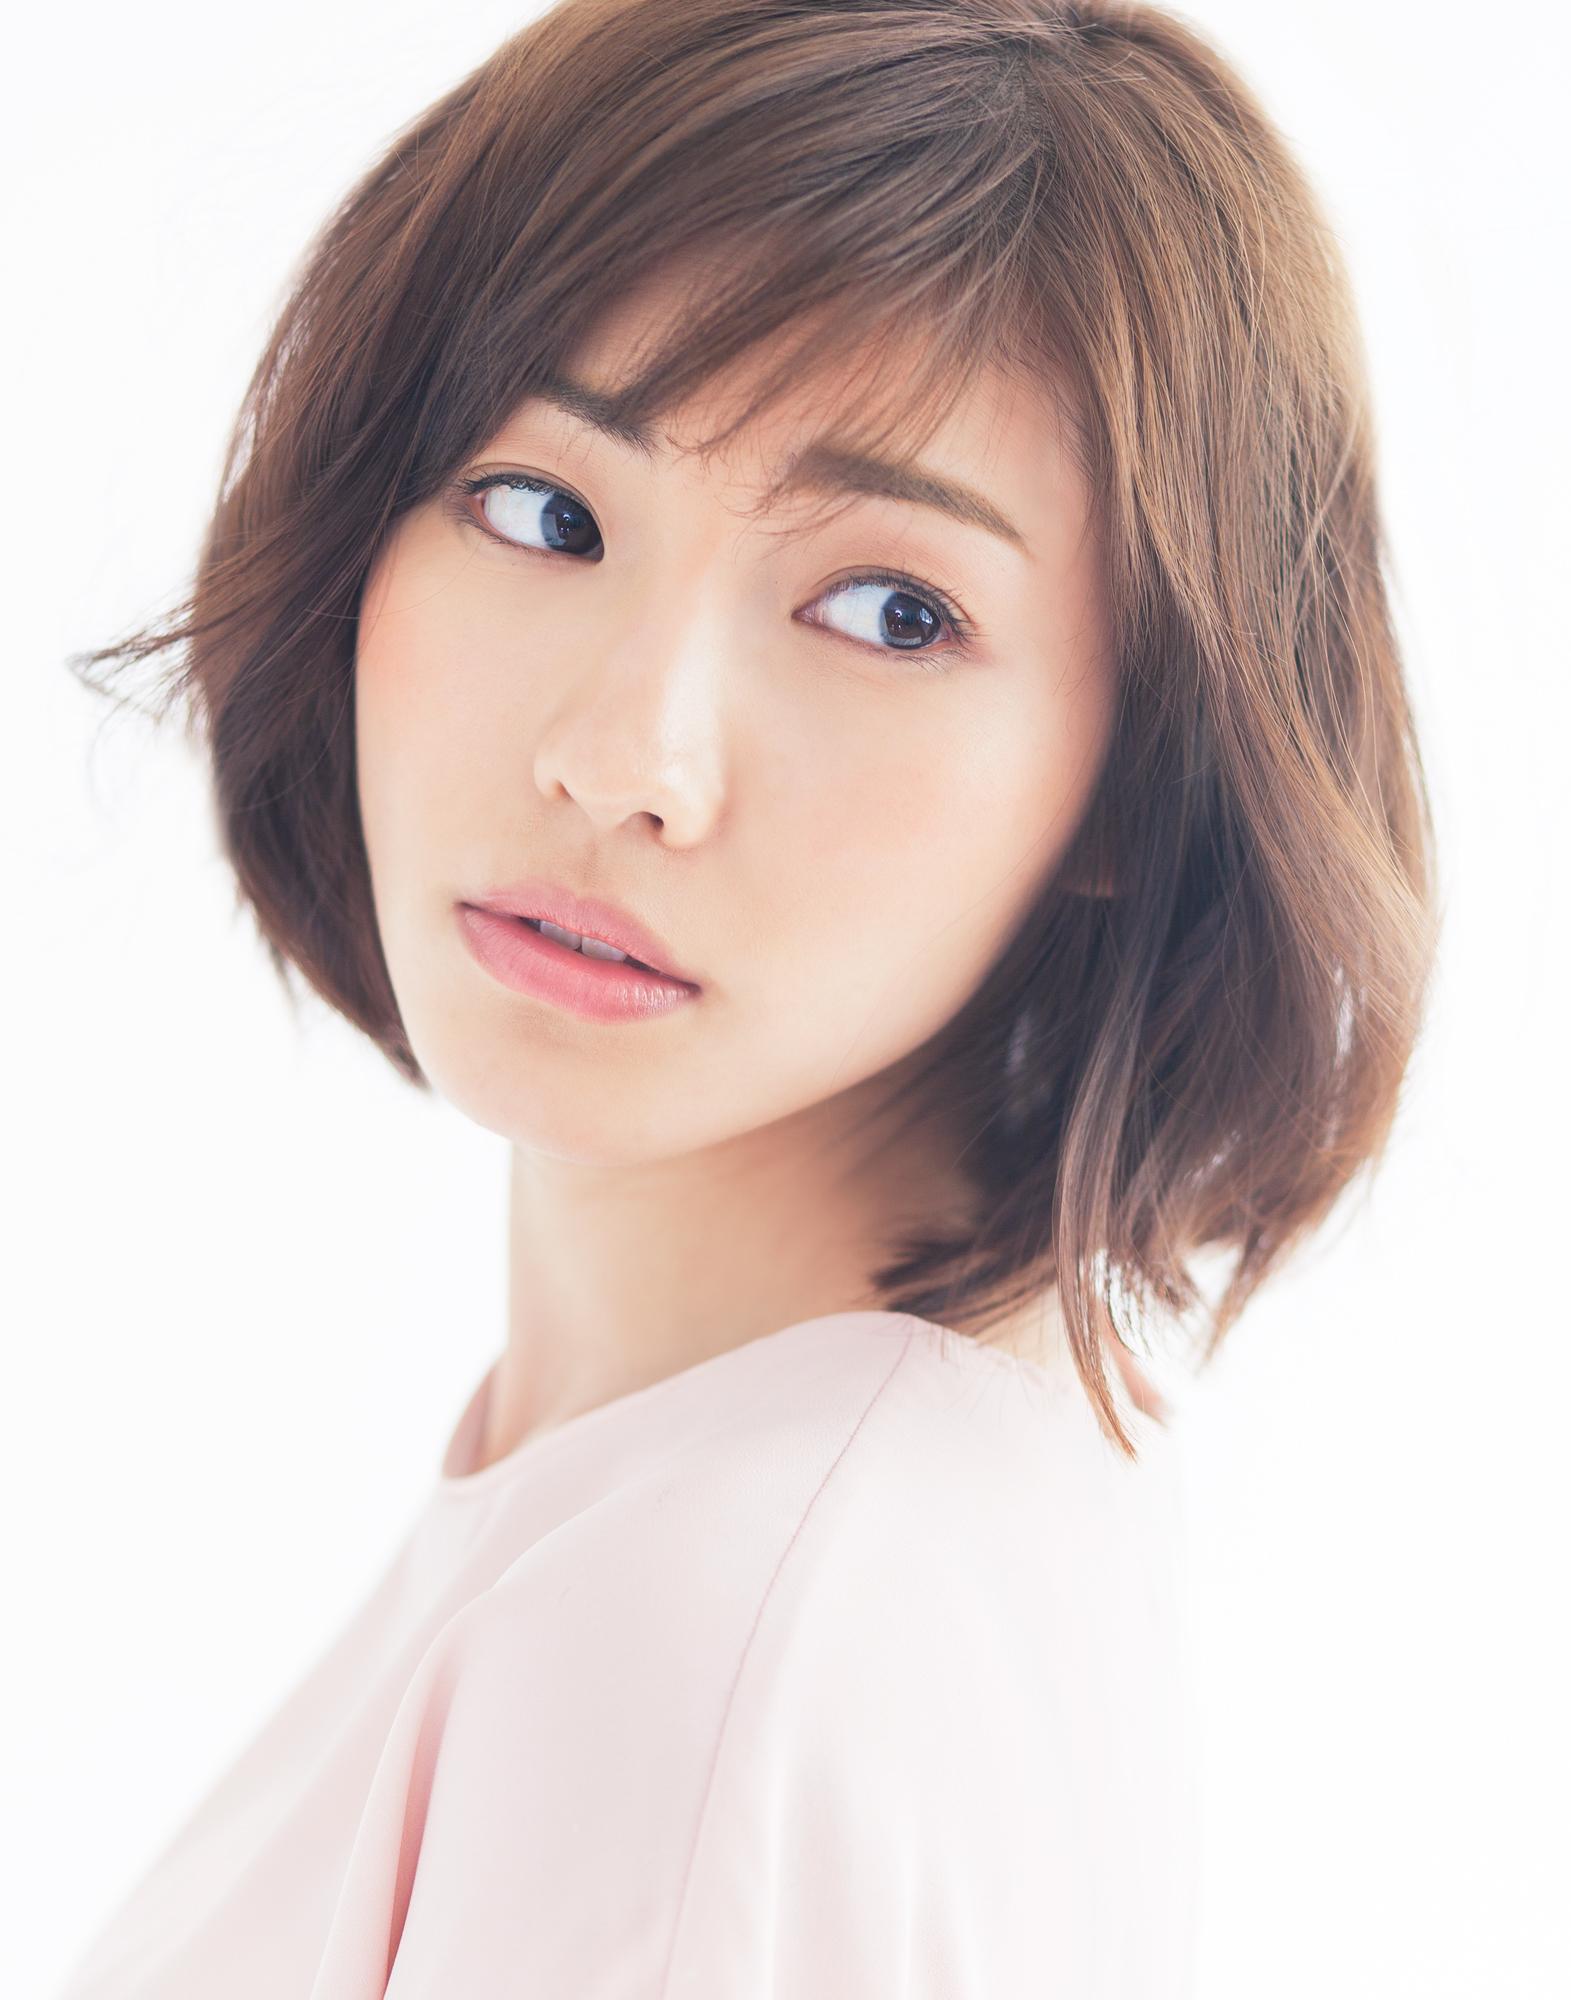 Hirata__0837.jpg